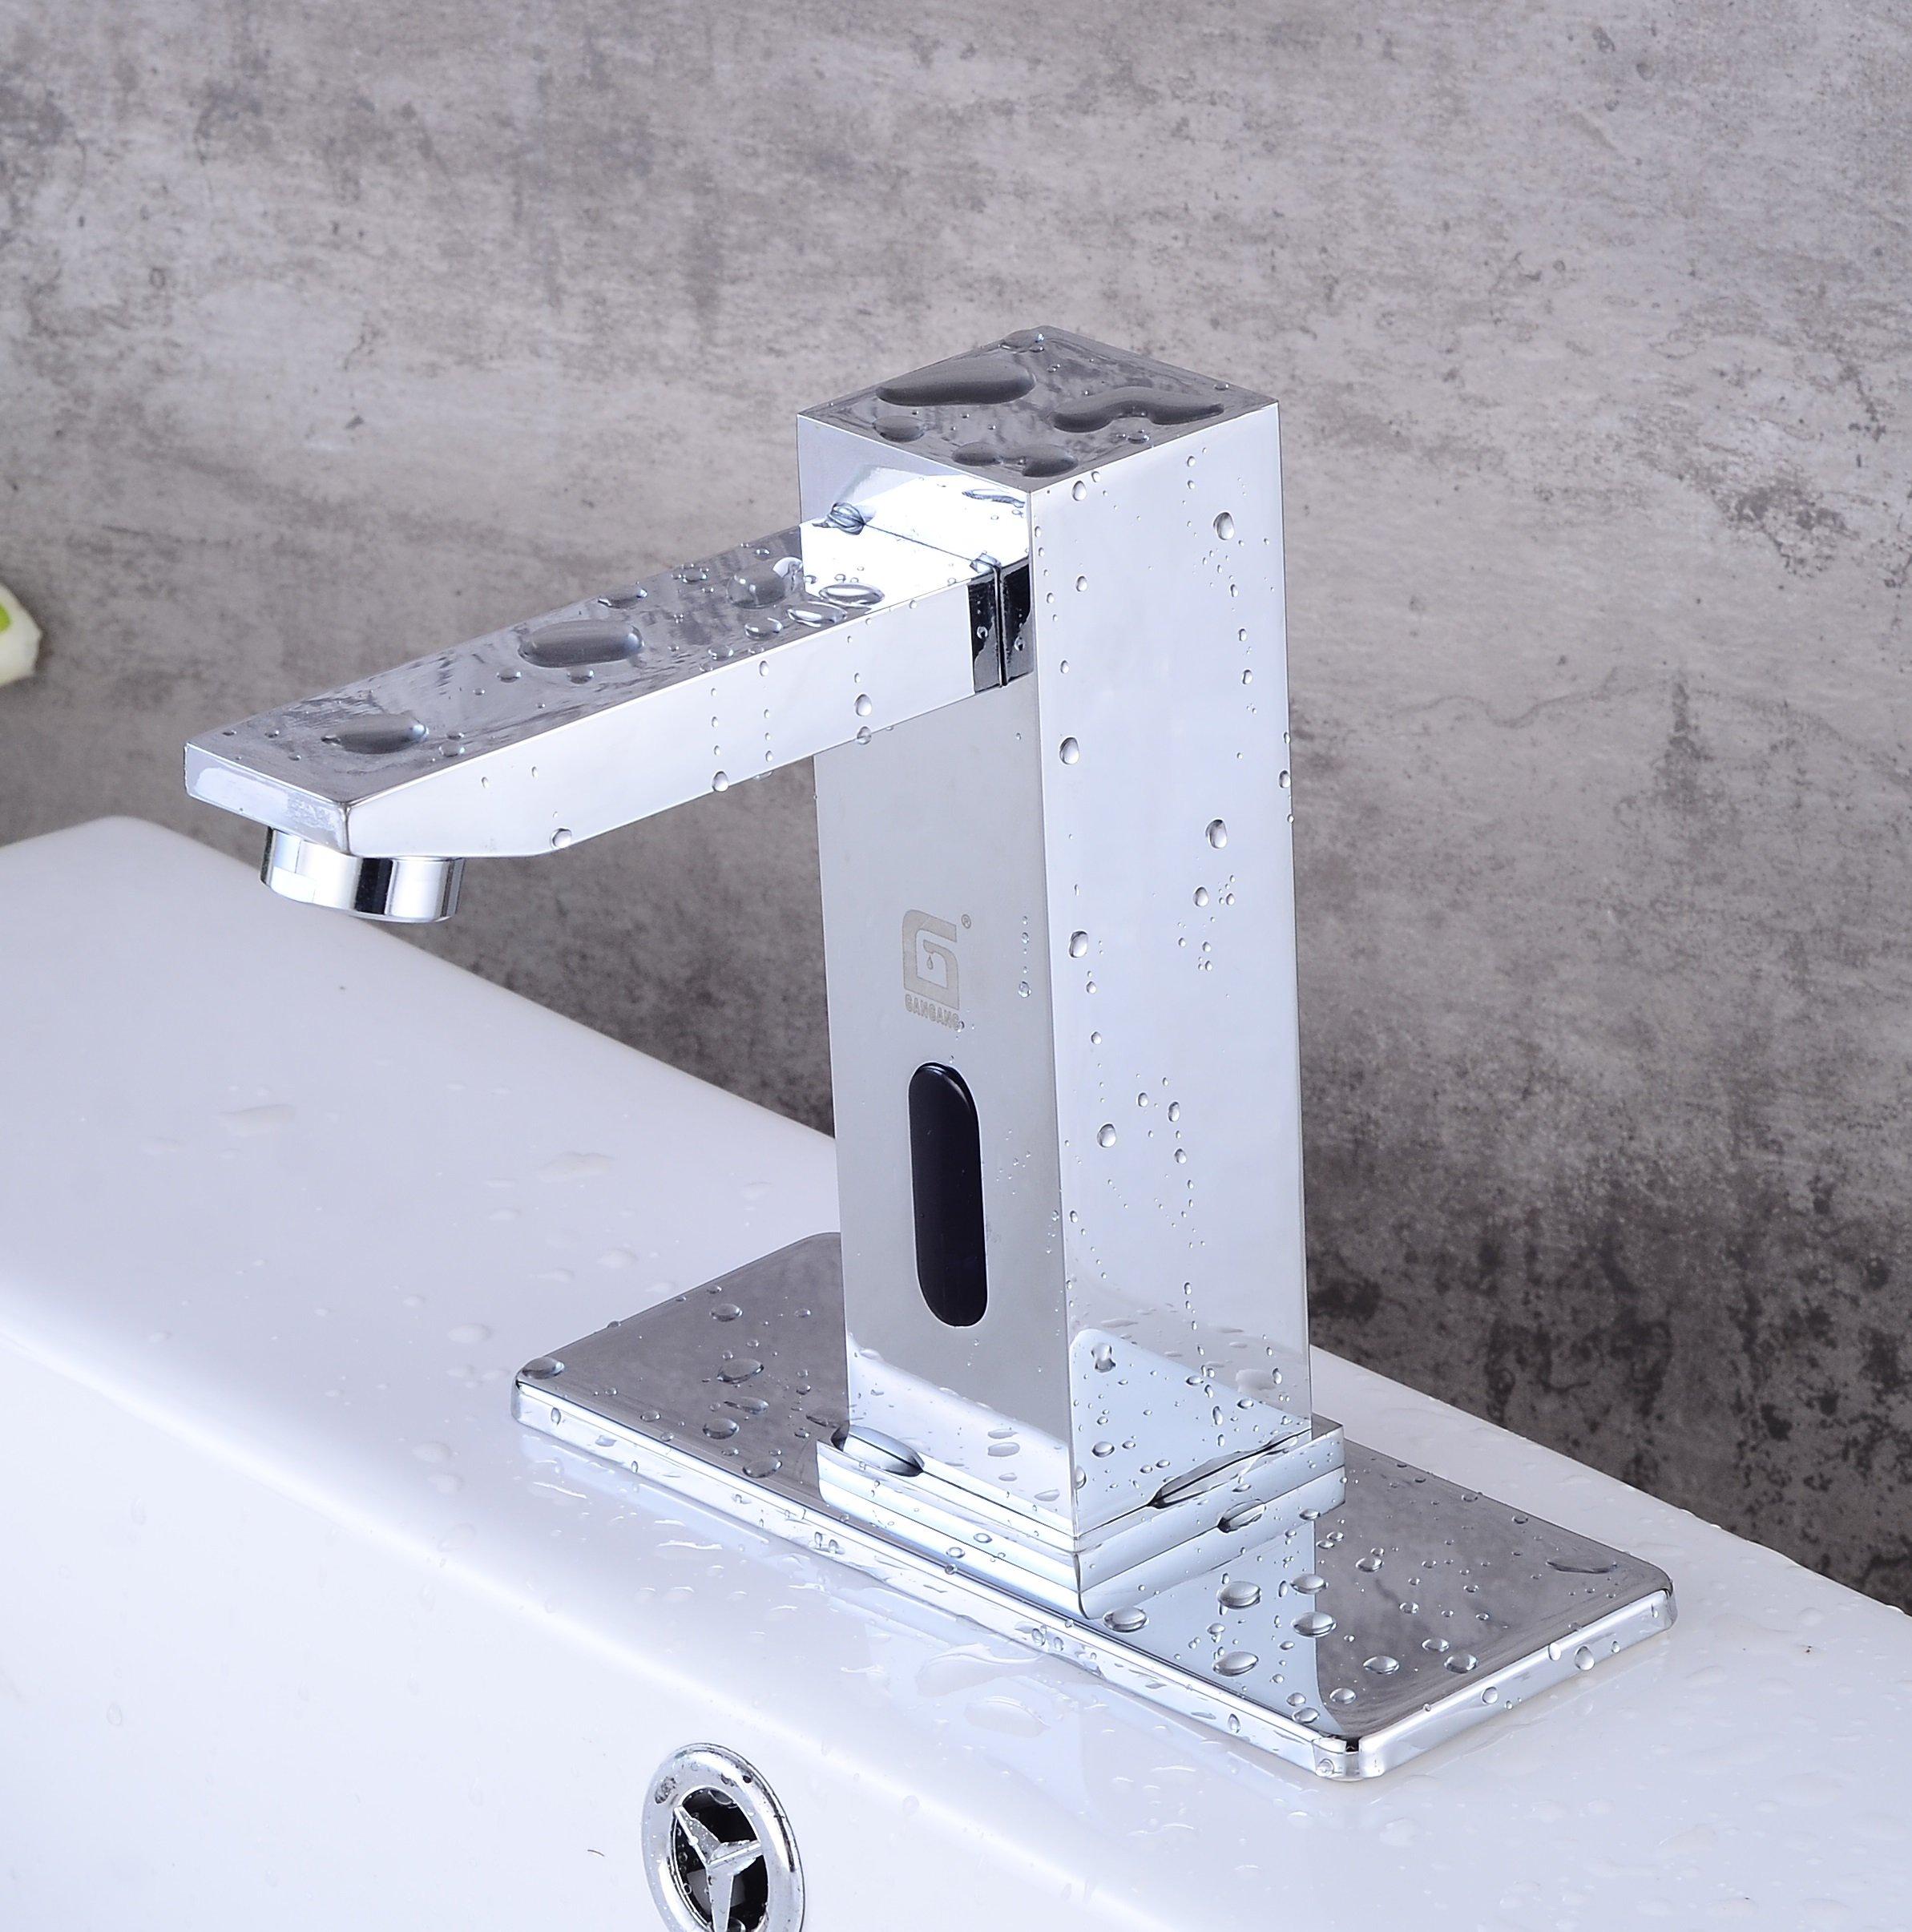 Gangang Deck Mount Solid Brass Auto Sensor Bathroom Sink Faucet with Automatic Sensor Chrome Bath Tub Faucet Unique Square Body Vanity Tub Faucets (Chrome)